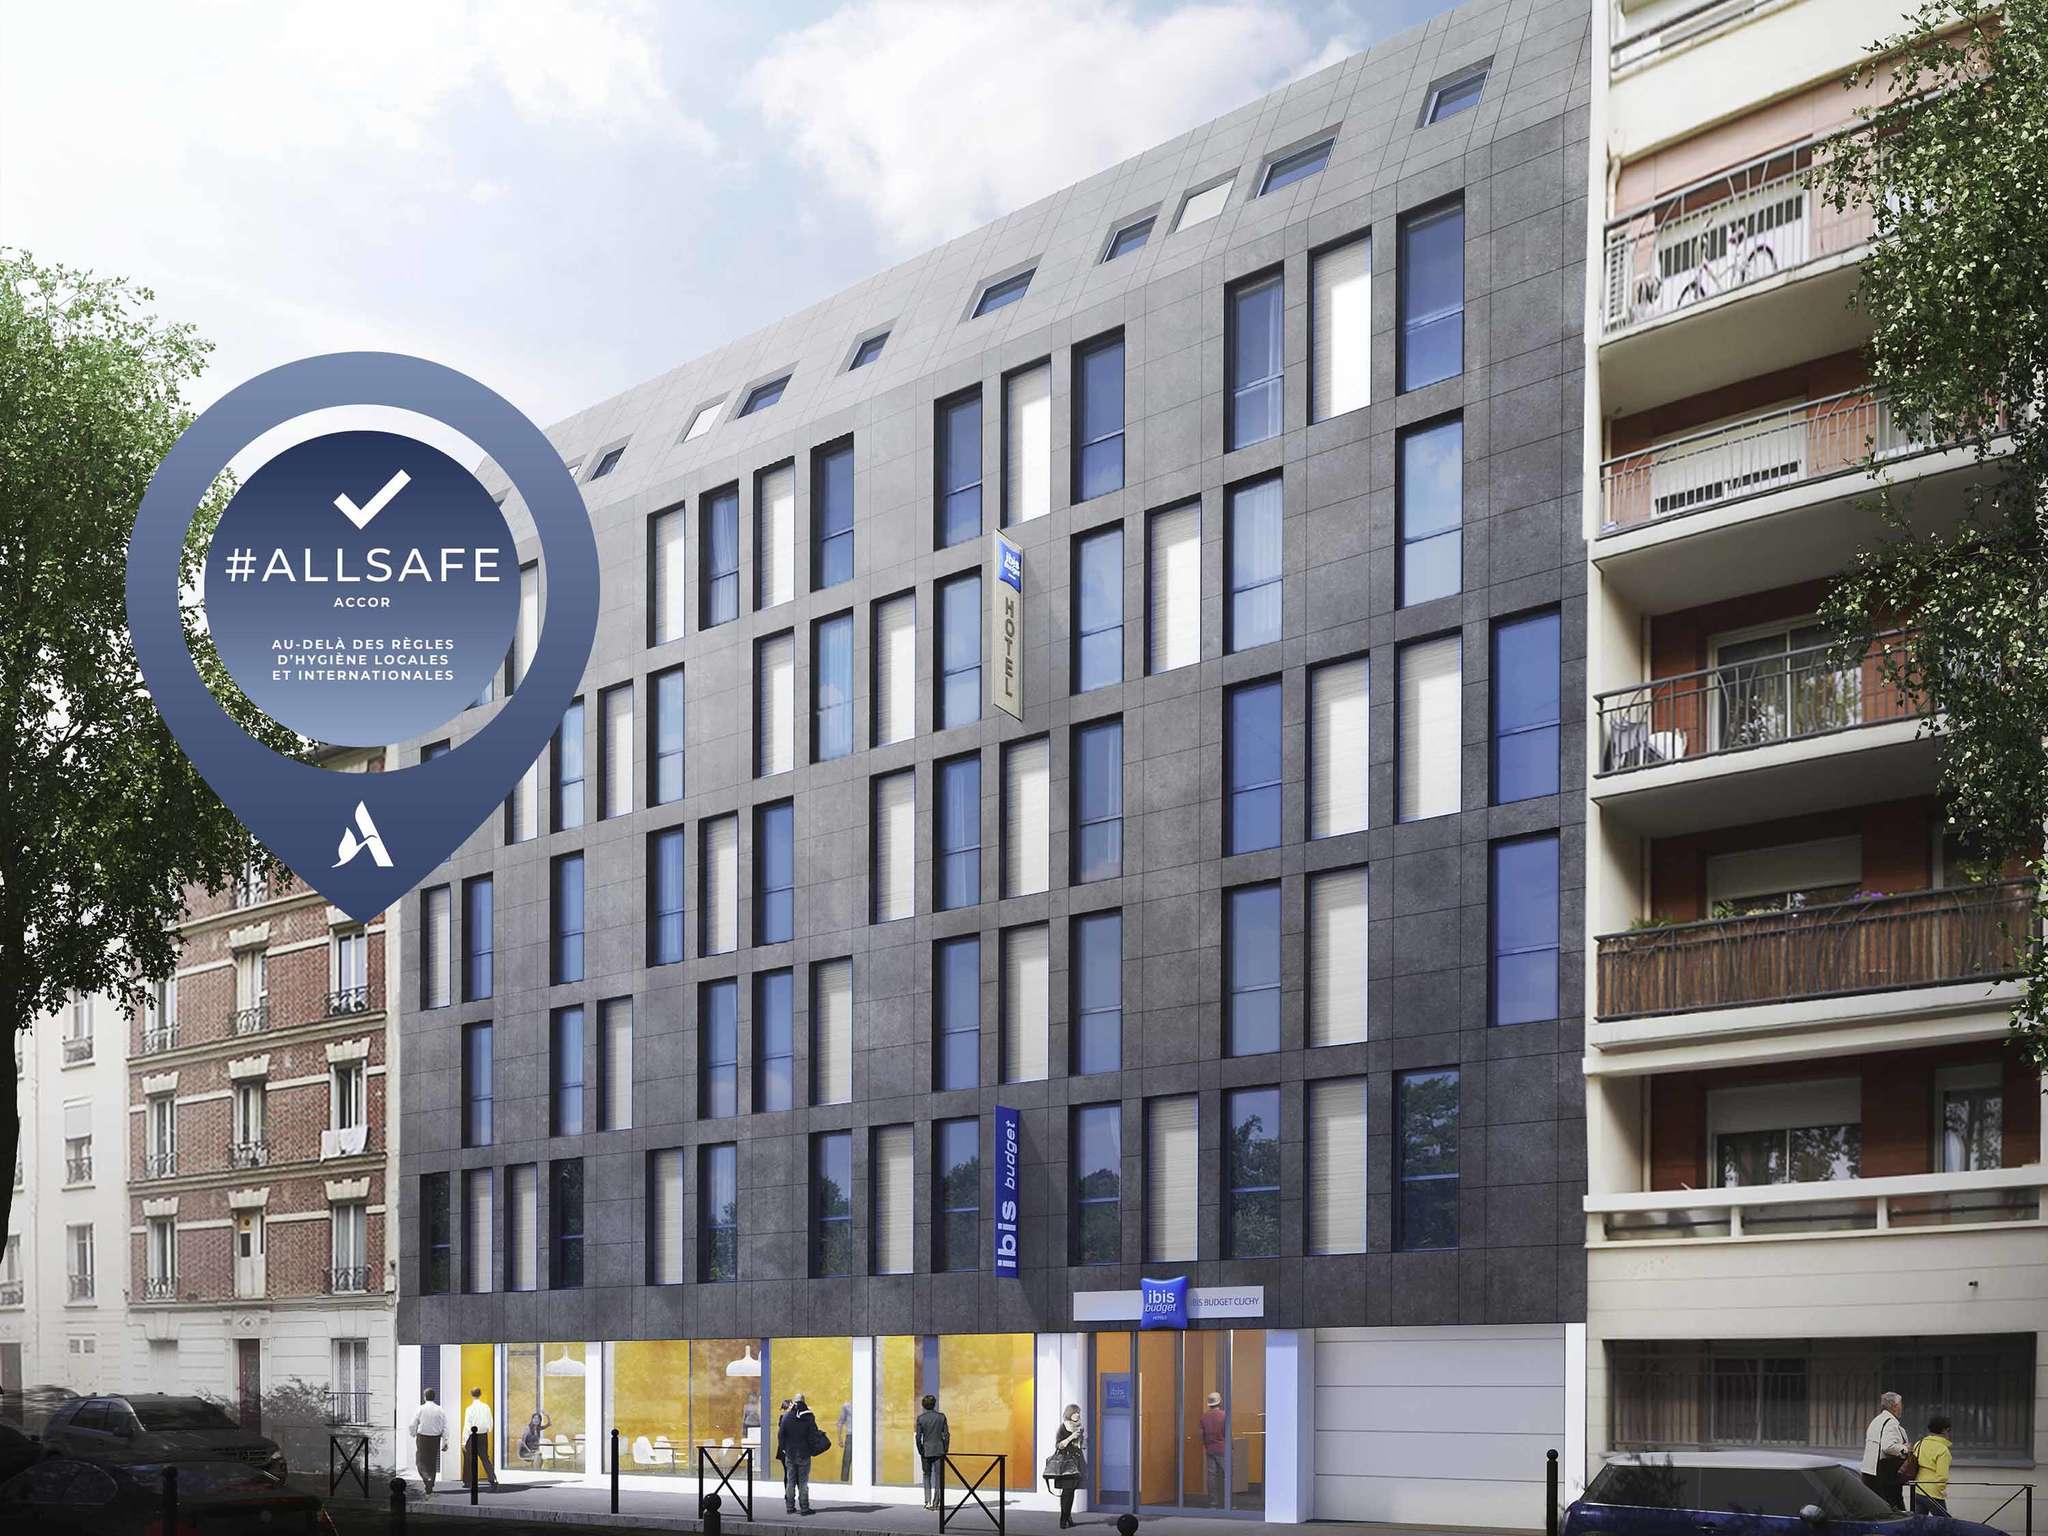 Hotel – ibis budget Paris Clichy Mairie (opening: april 2018)